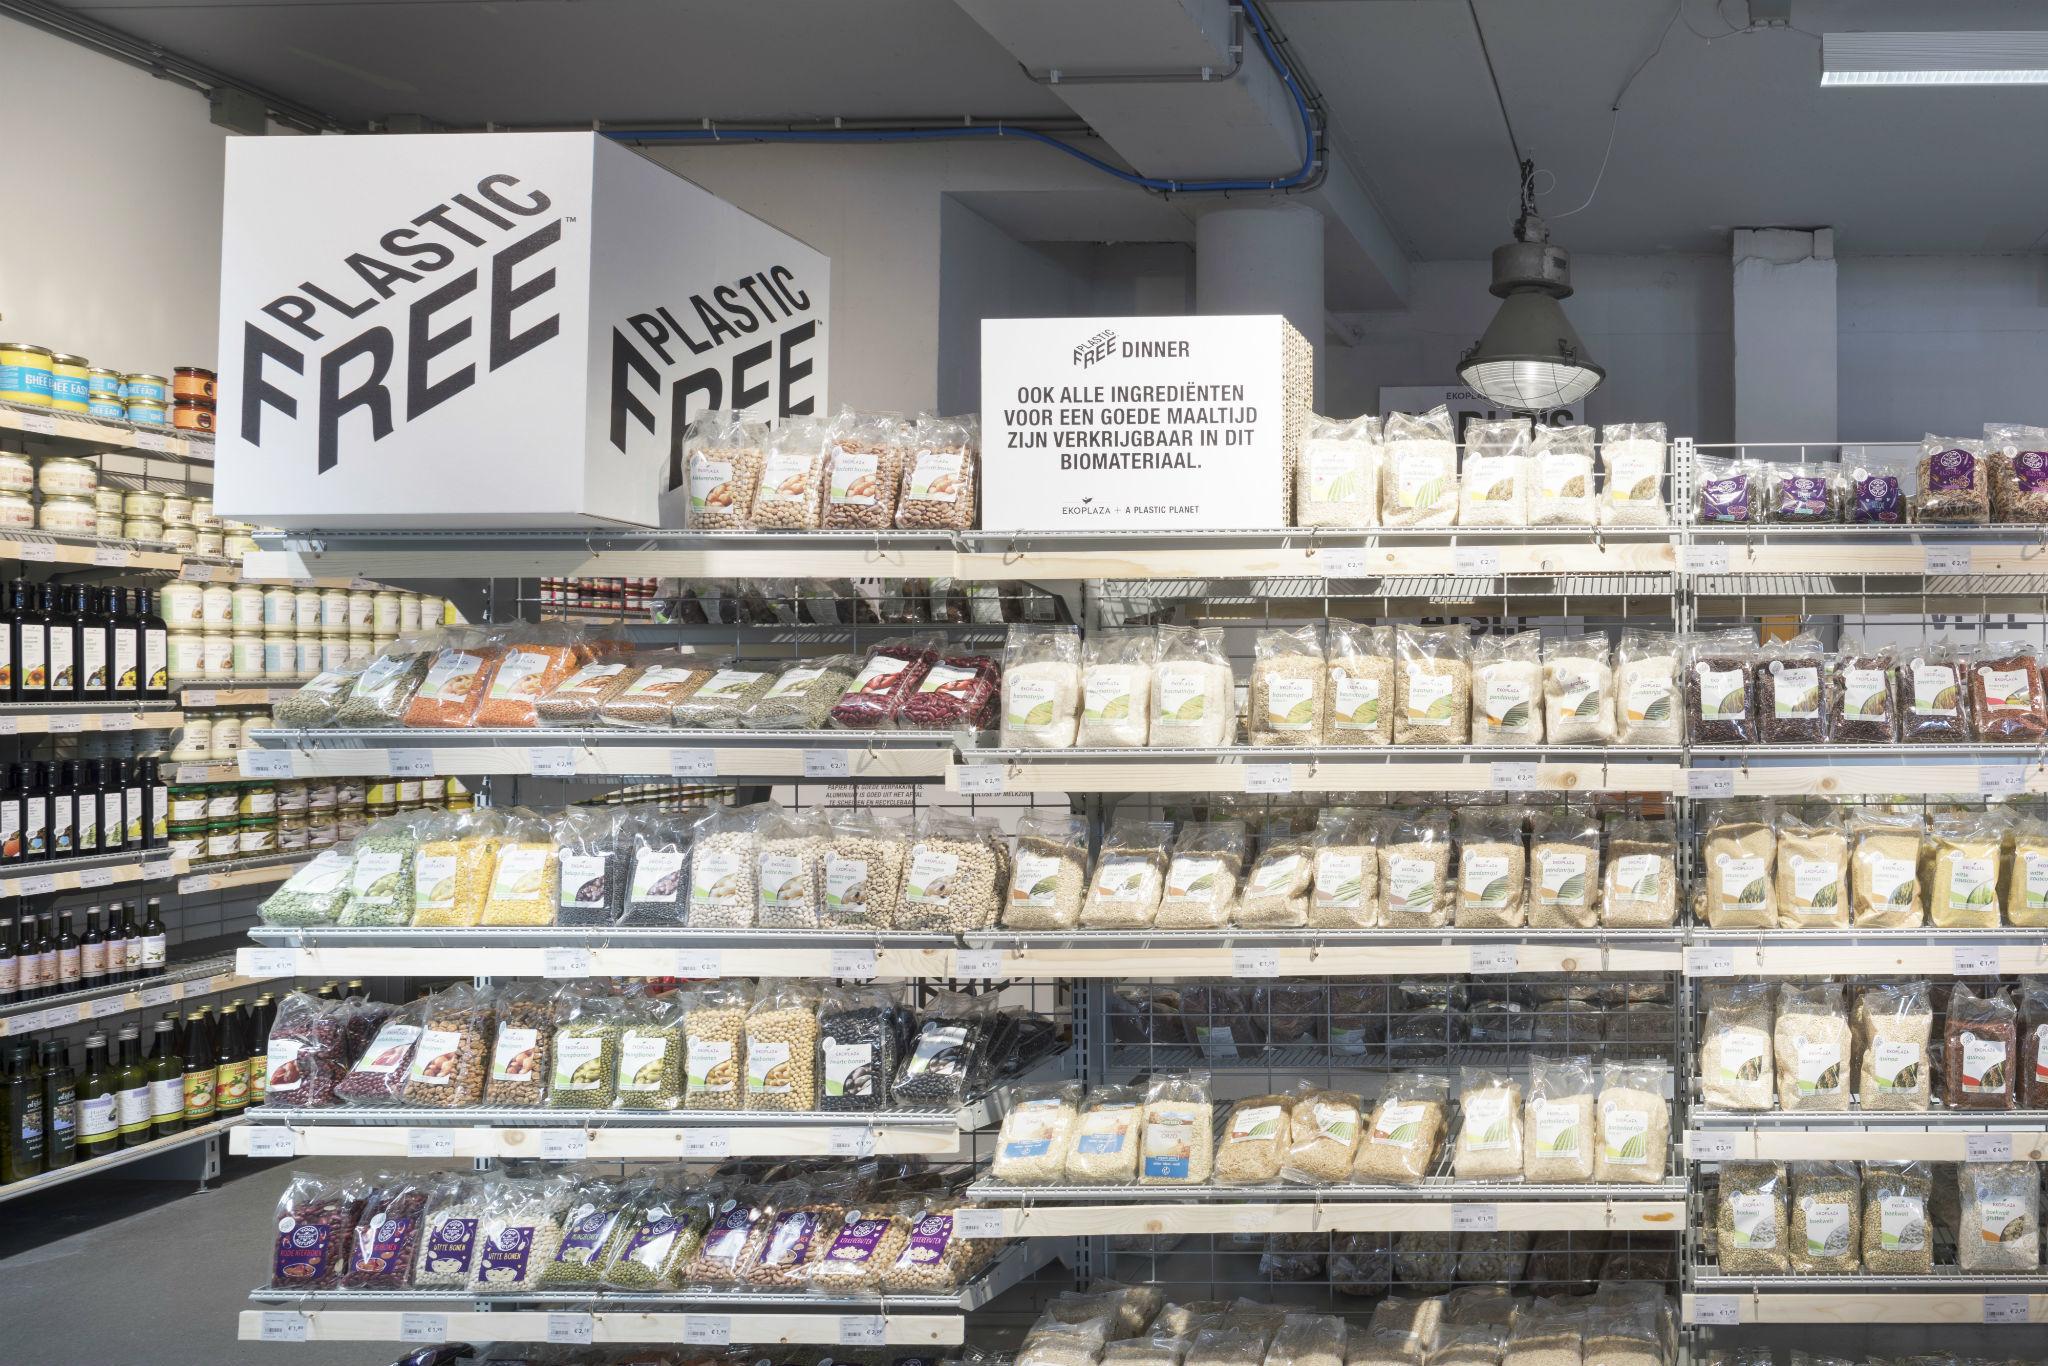 City envy: we want a plastic-free supermarket aisle like Amsterdam